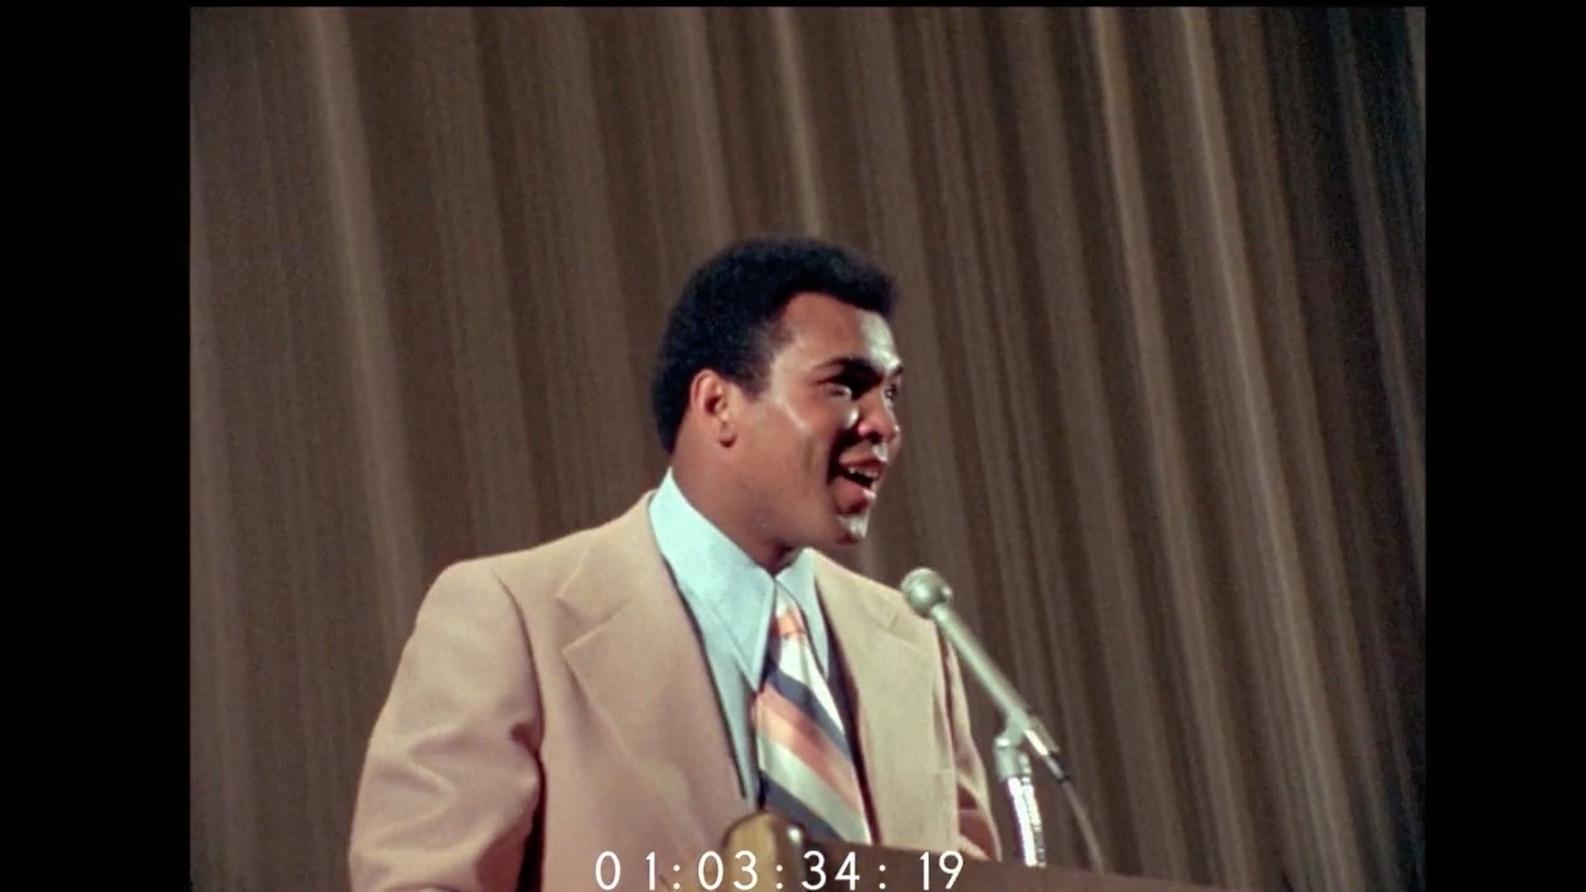 In 1975, Harvard got a glimpse of Muhammad Ali's true greatness